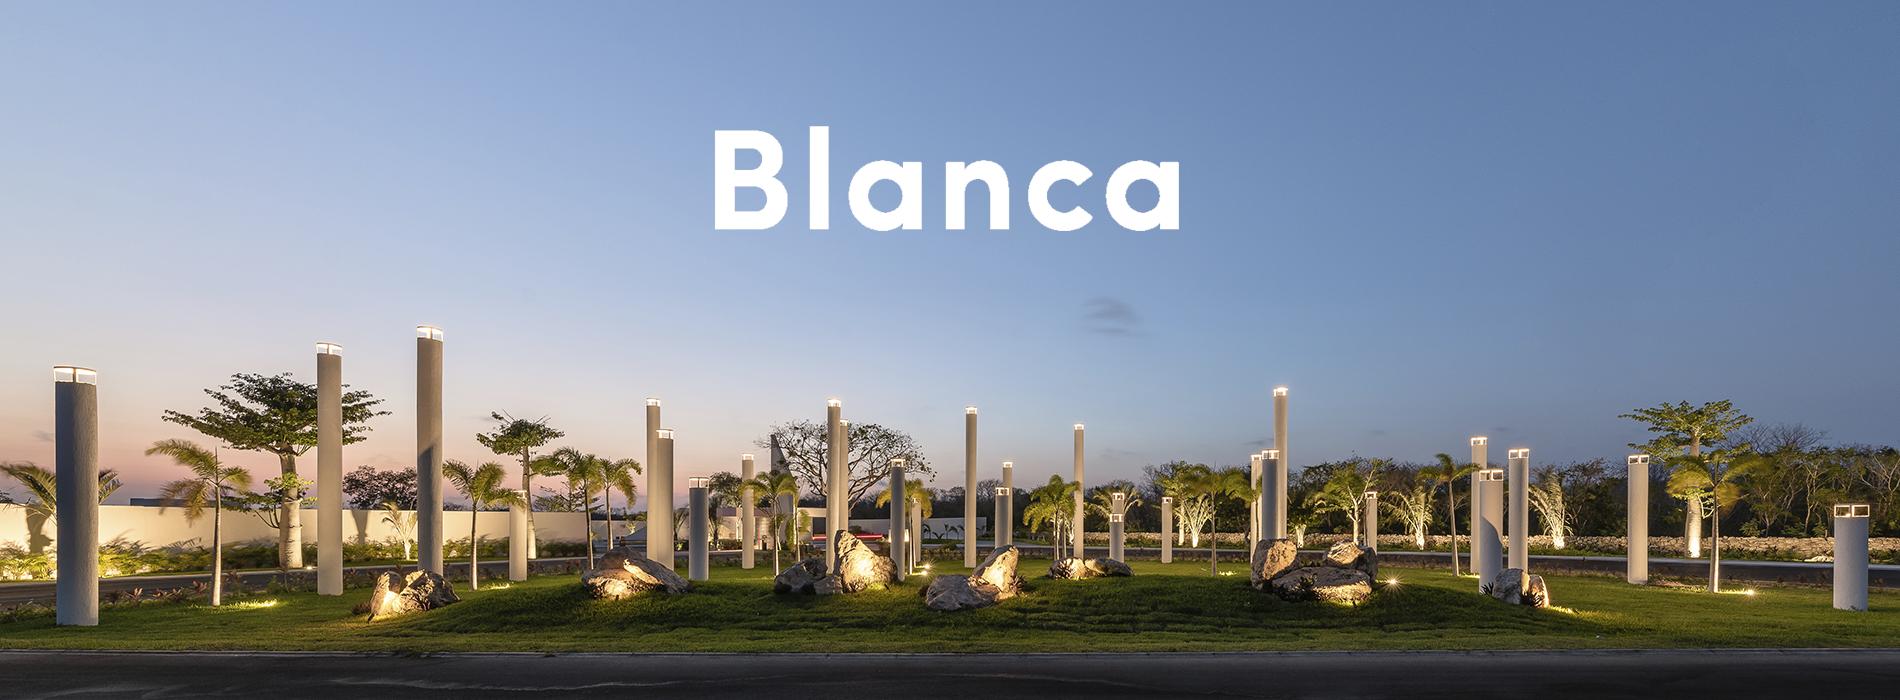 Terrenos Residenciales Venta Mérida Blanca Mérida Goodlers